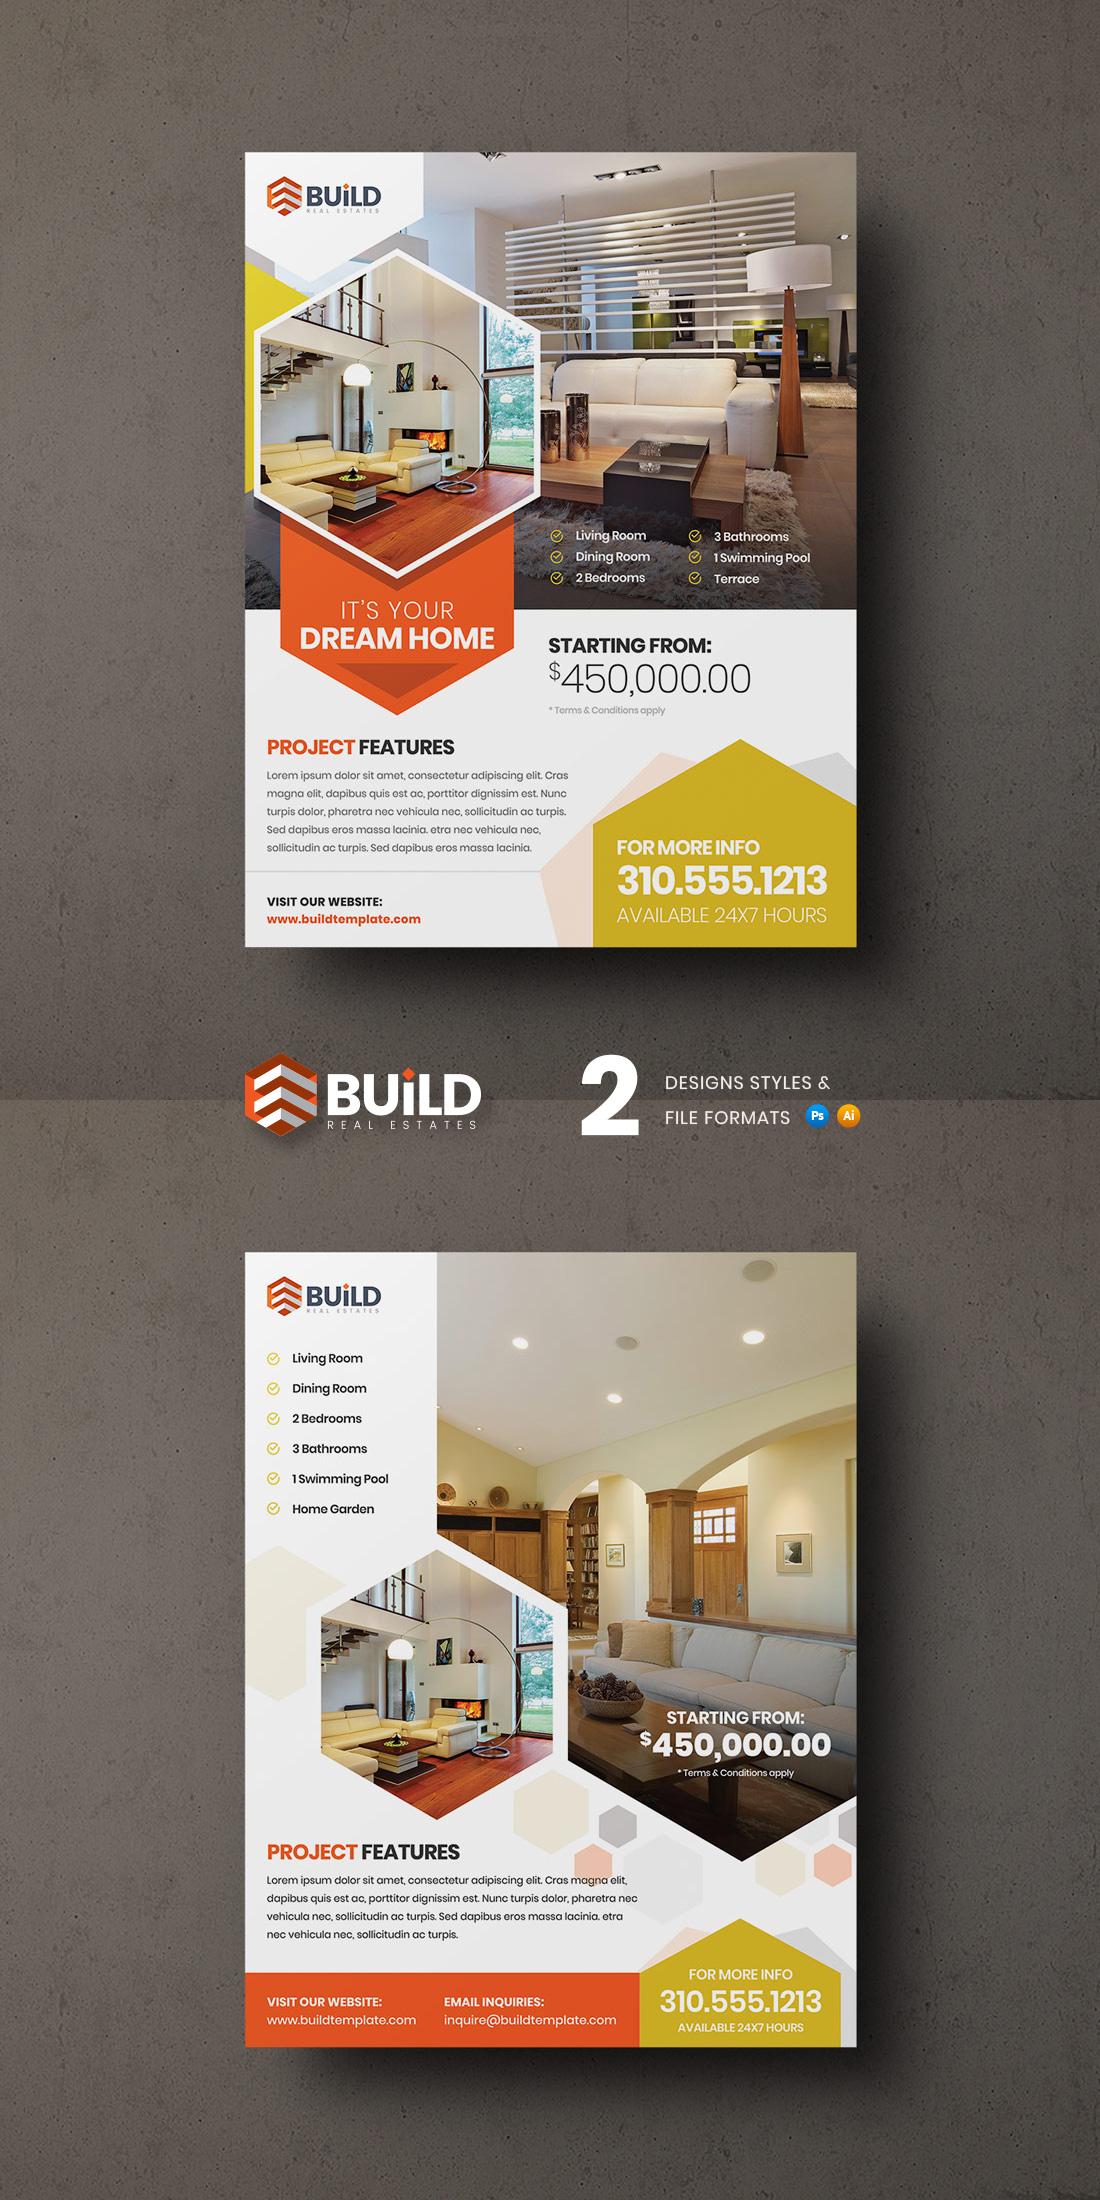 Build Real- Estate flyer by Saptarang